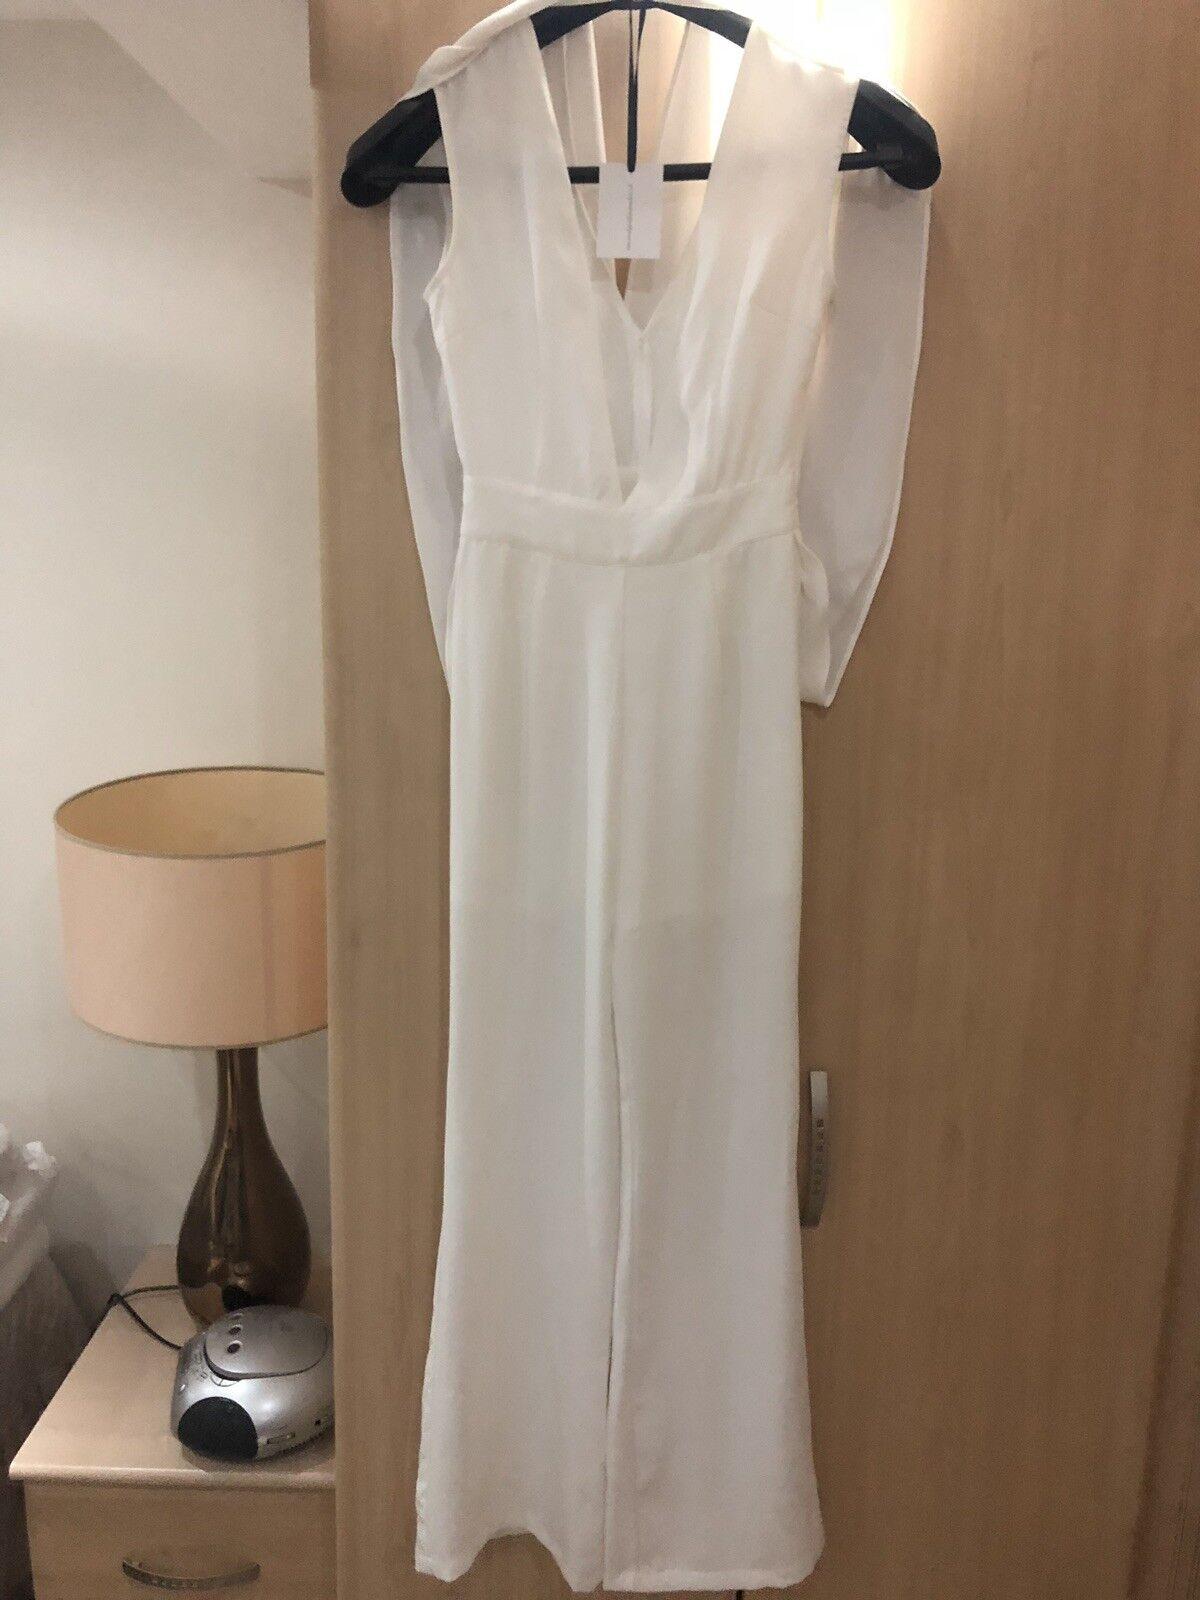 Ladies jumpsuit size 8 White Handmade Never Worn